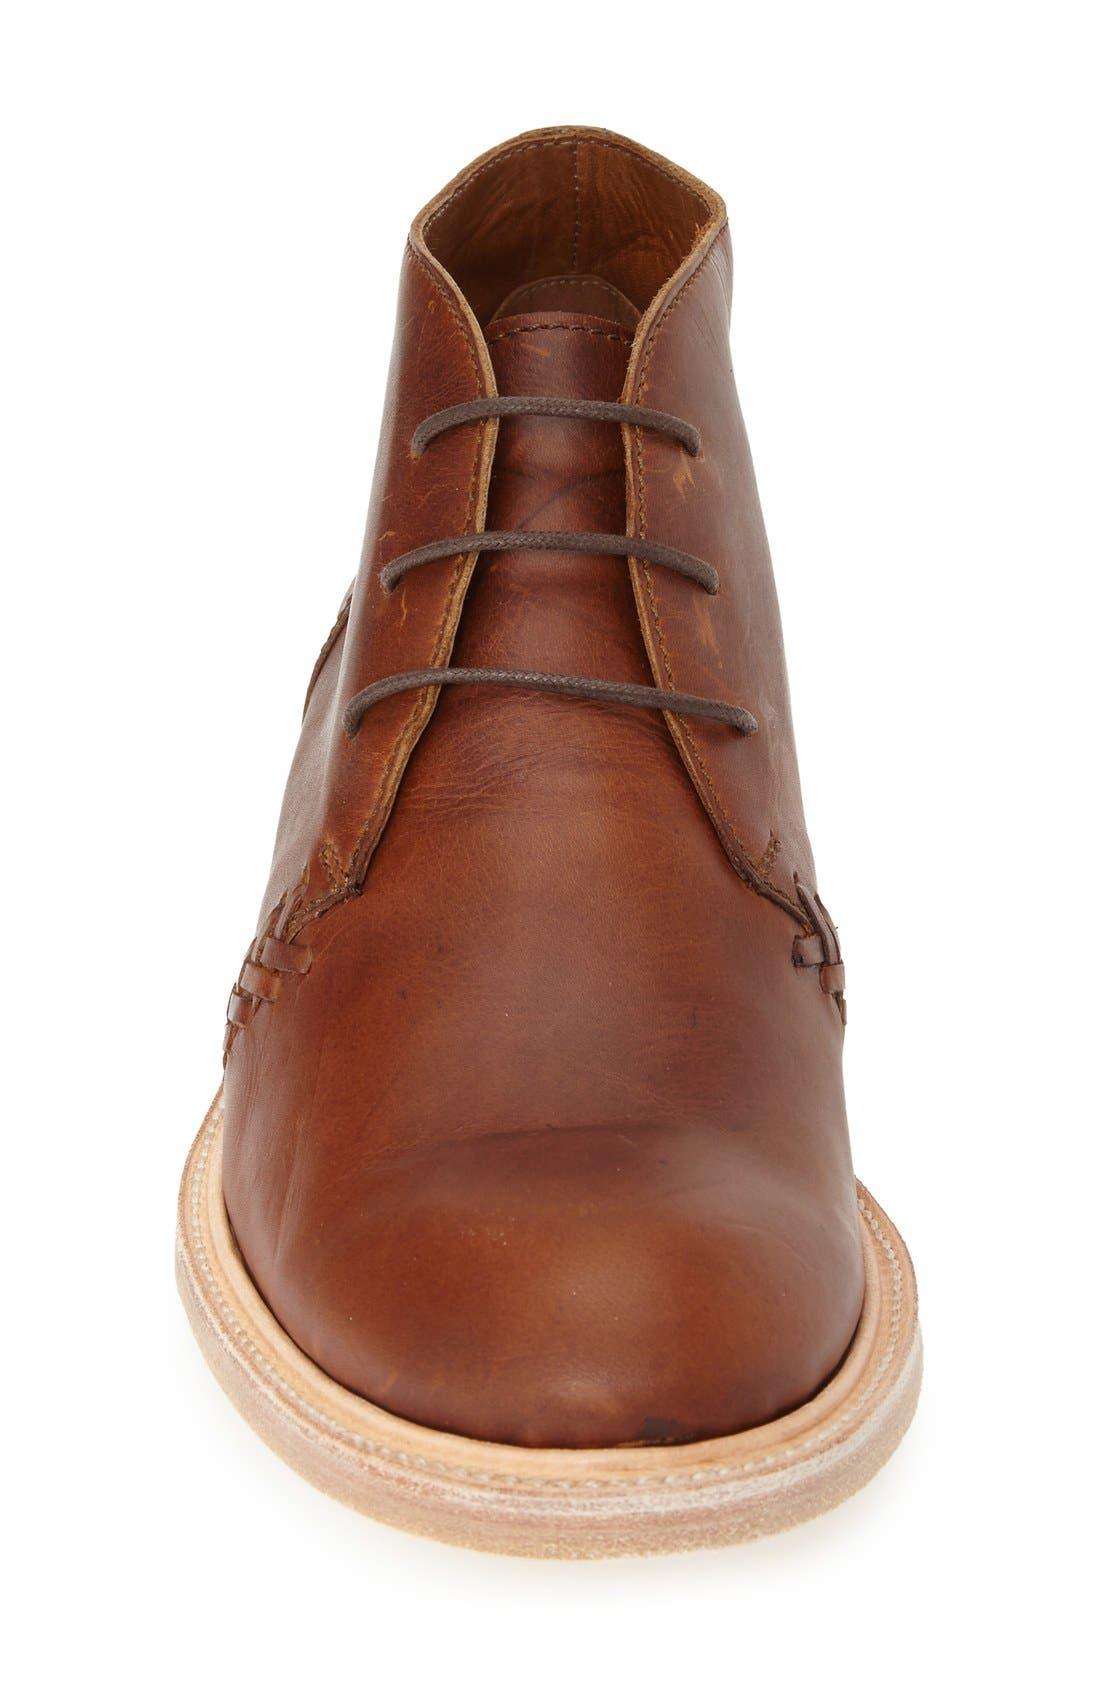 Boots 'Noris' Chukka Boot,                             Alternate thumbnail 3, color,                             Evolution Tan